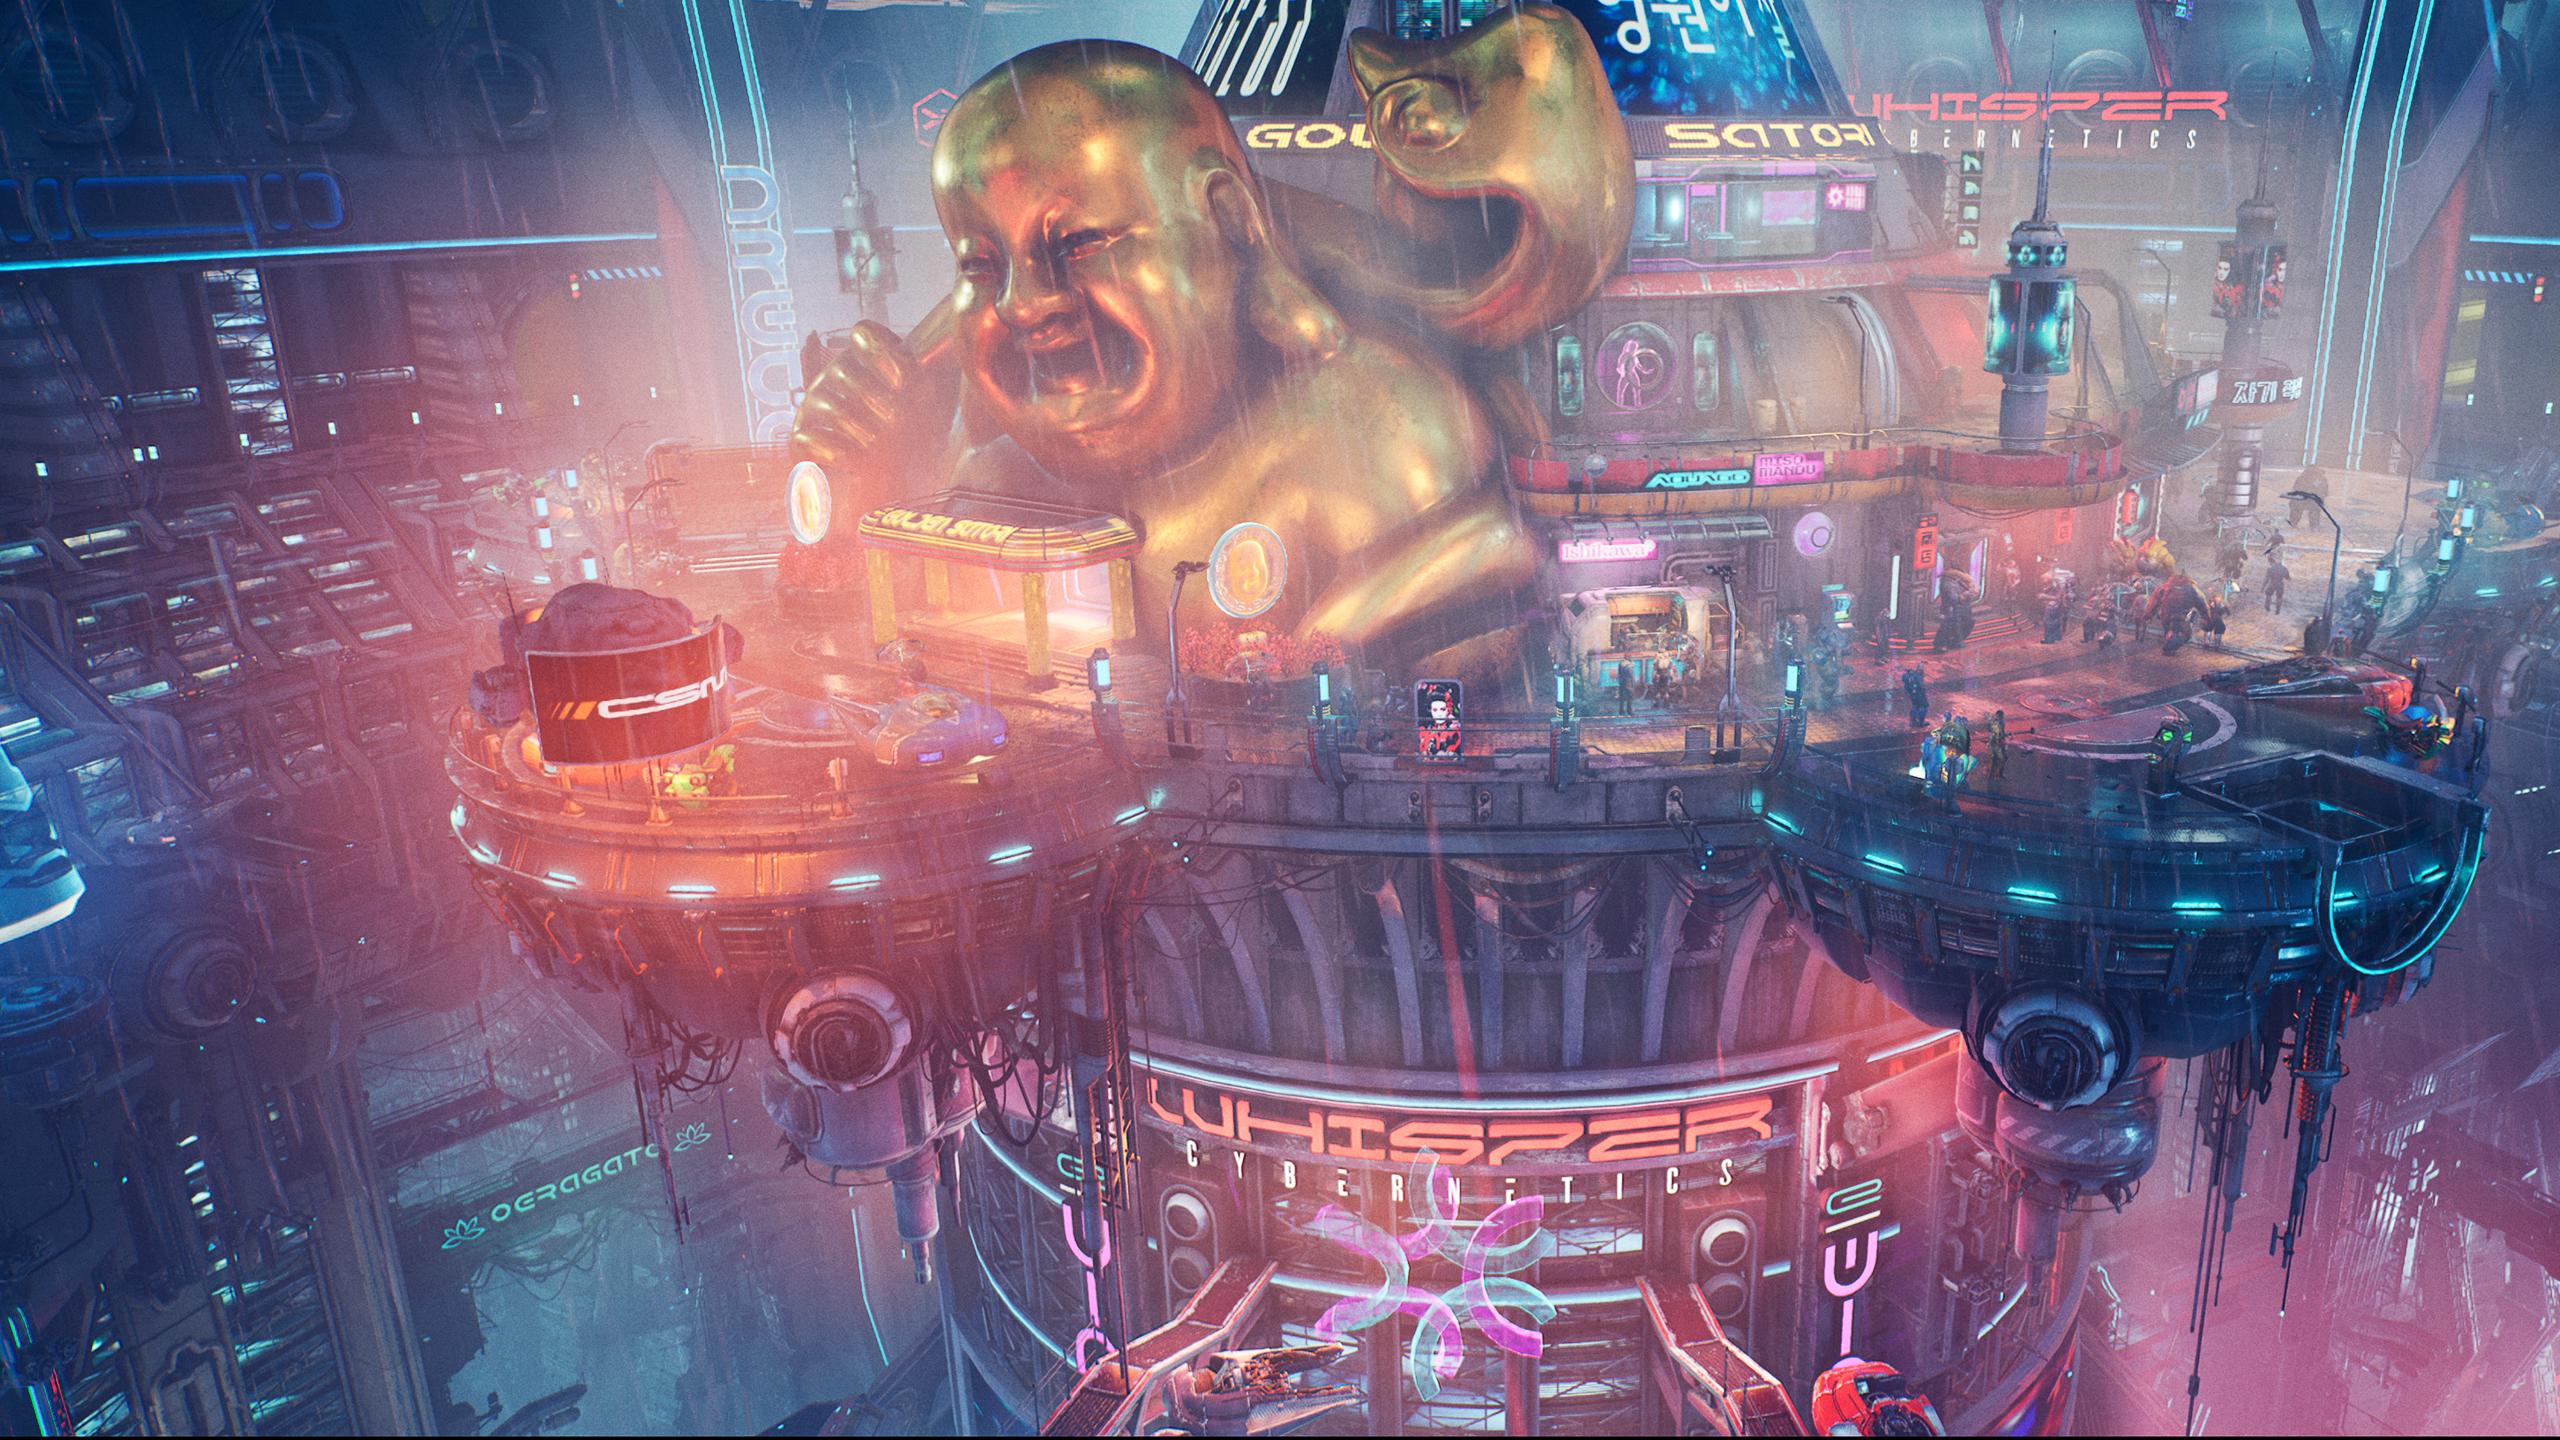 A futuristic casino